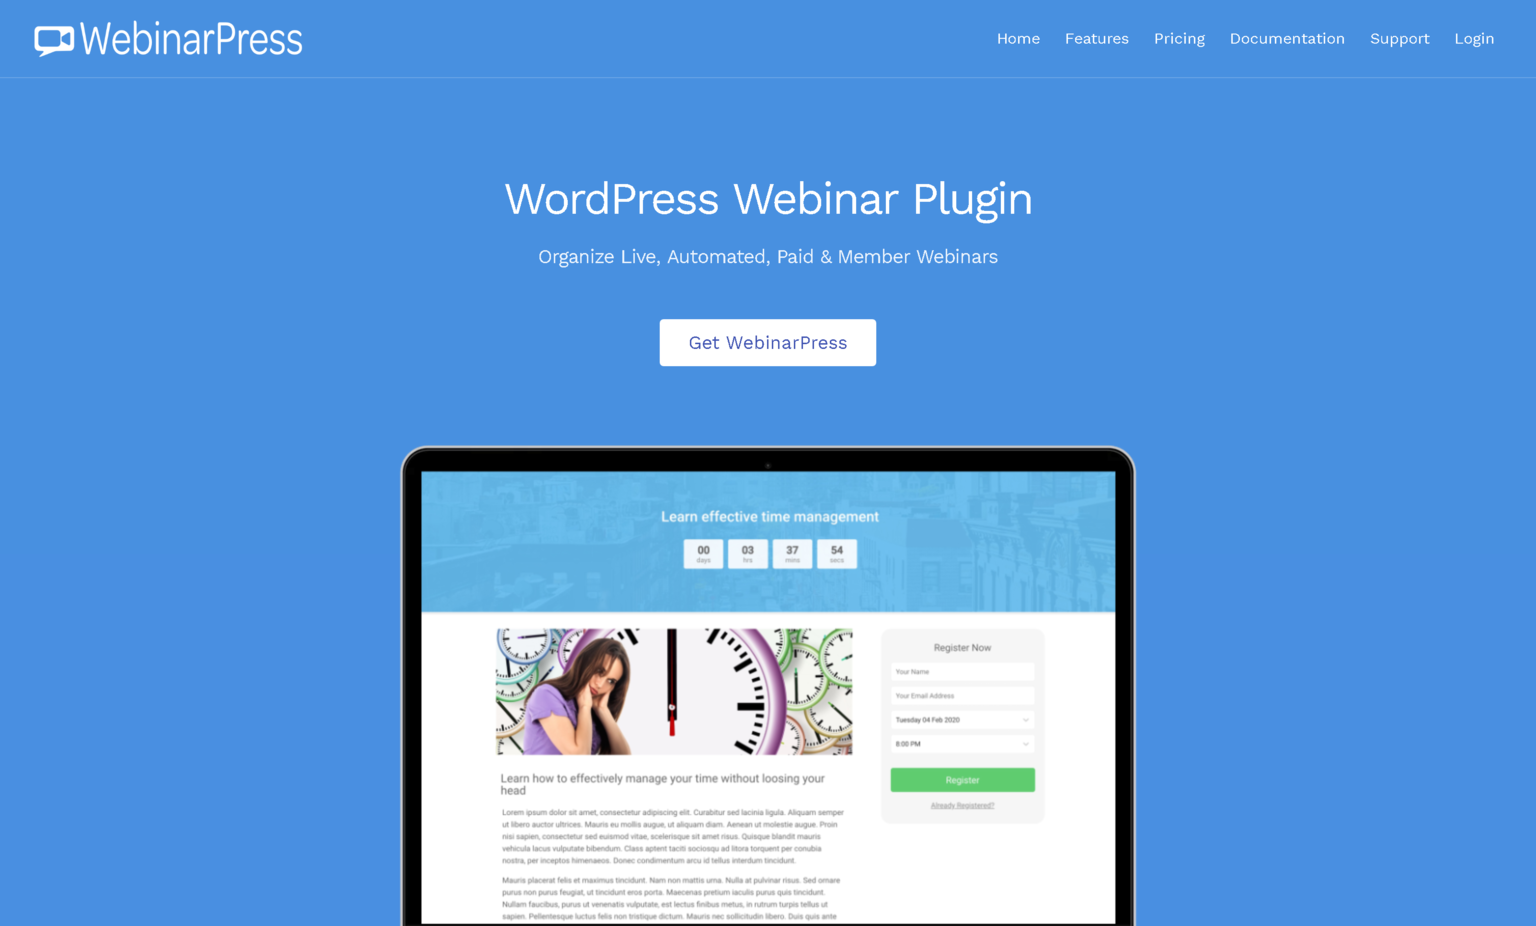 WebinarPress Pro 2.24.30 – WordPress Webinar Plugin: Organize Live, Automated, Paid & Member Webinars